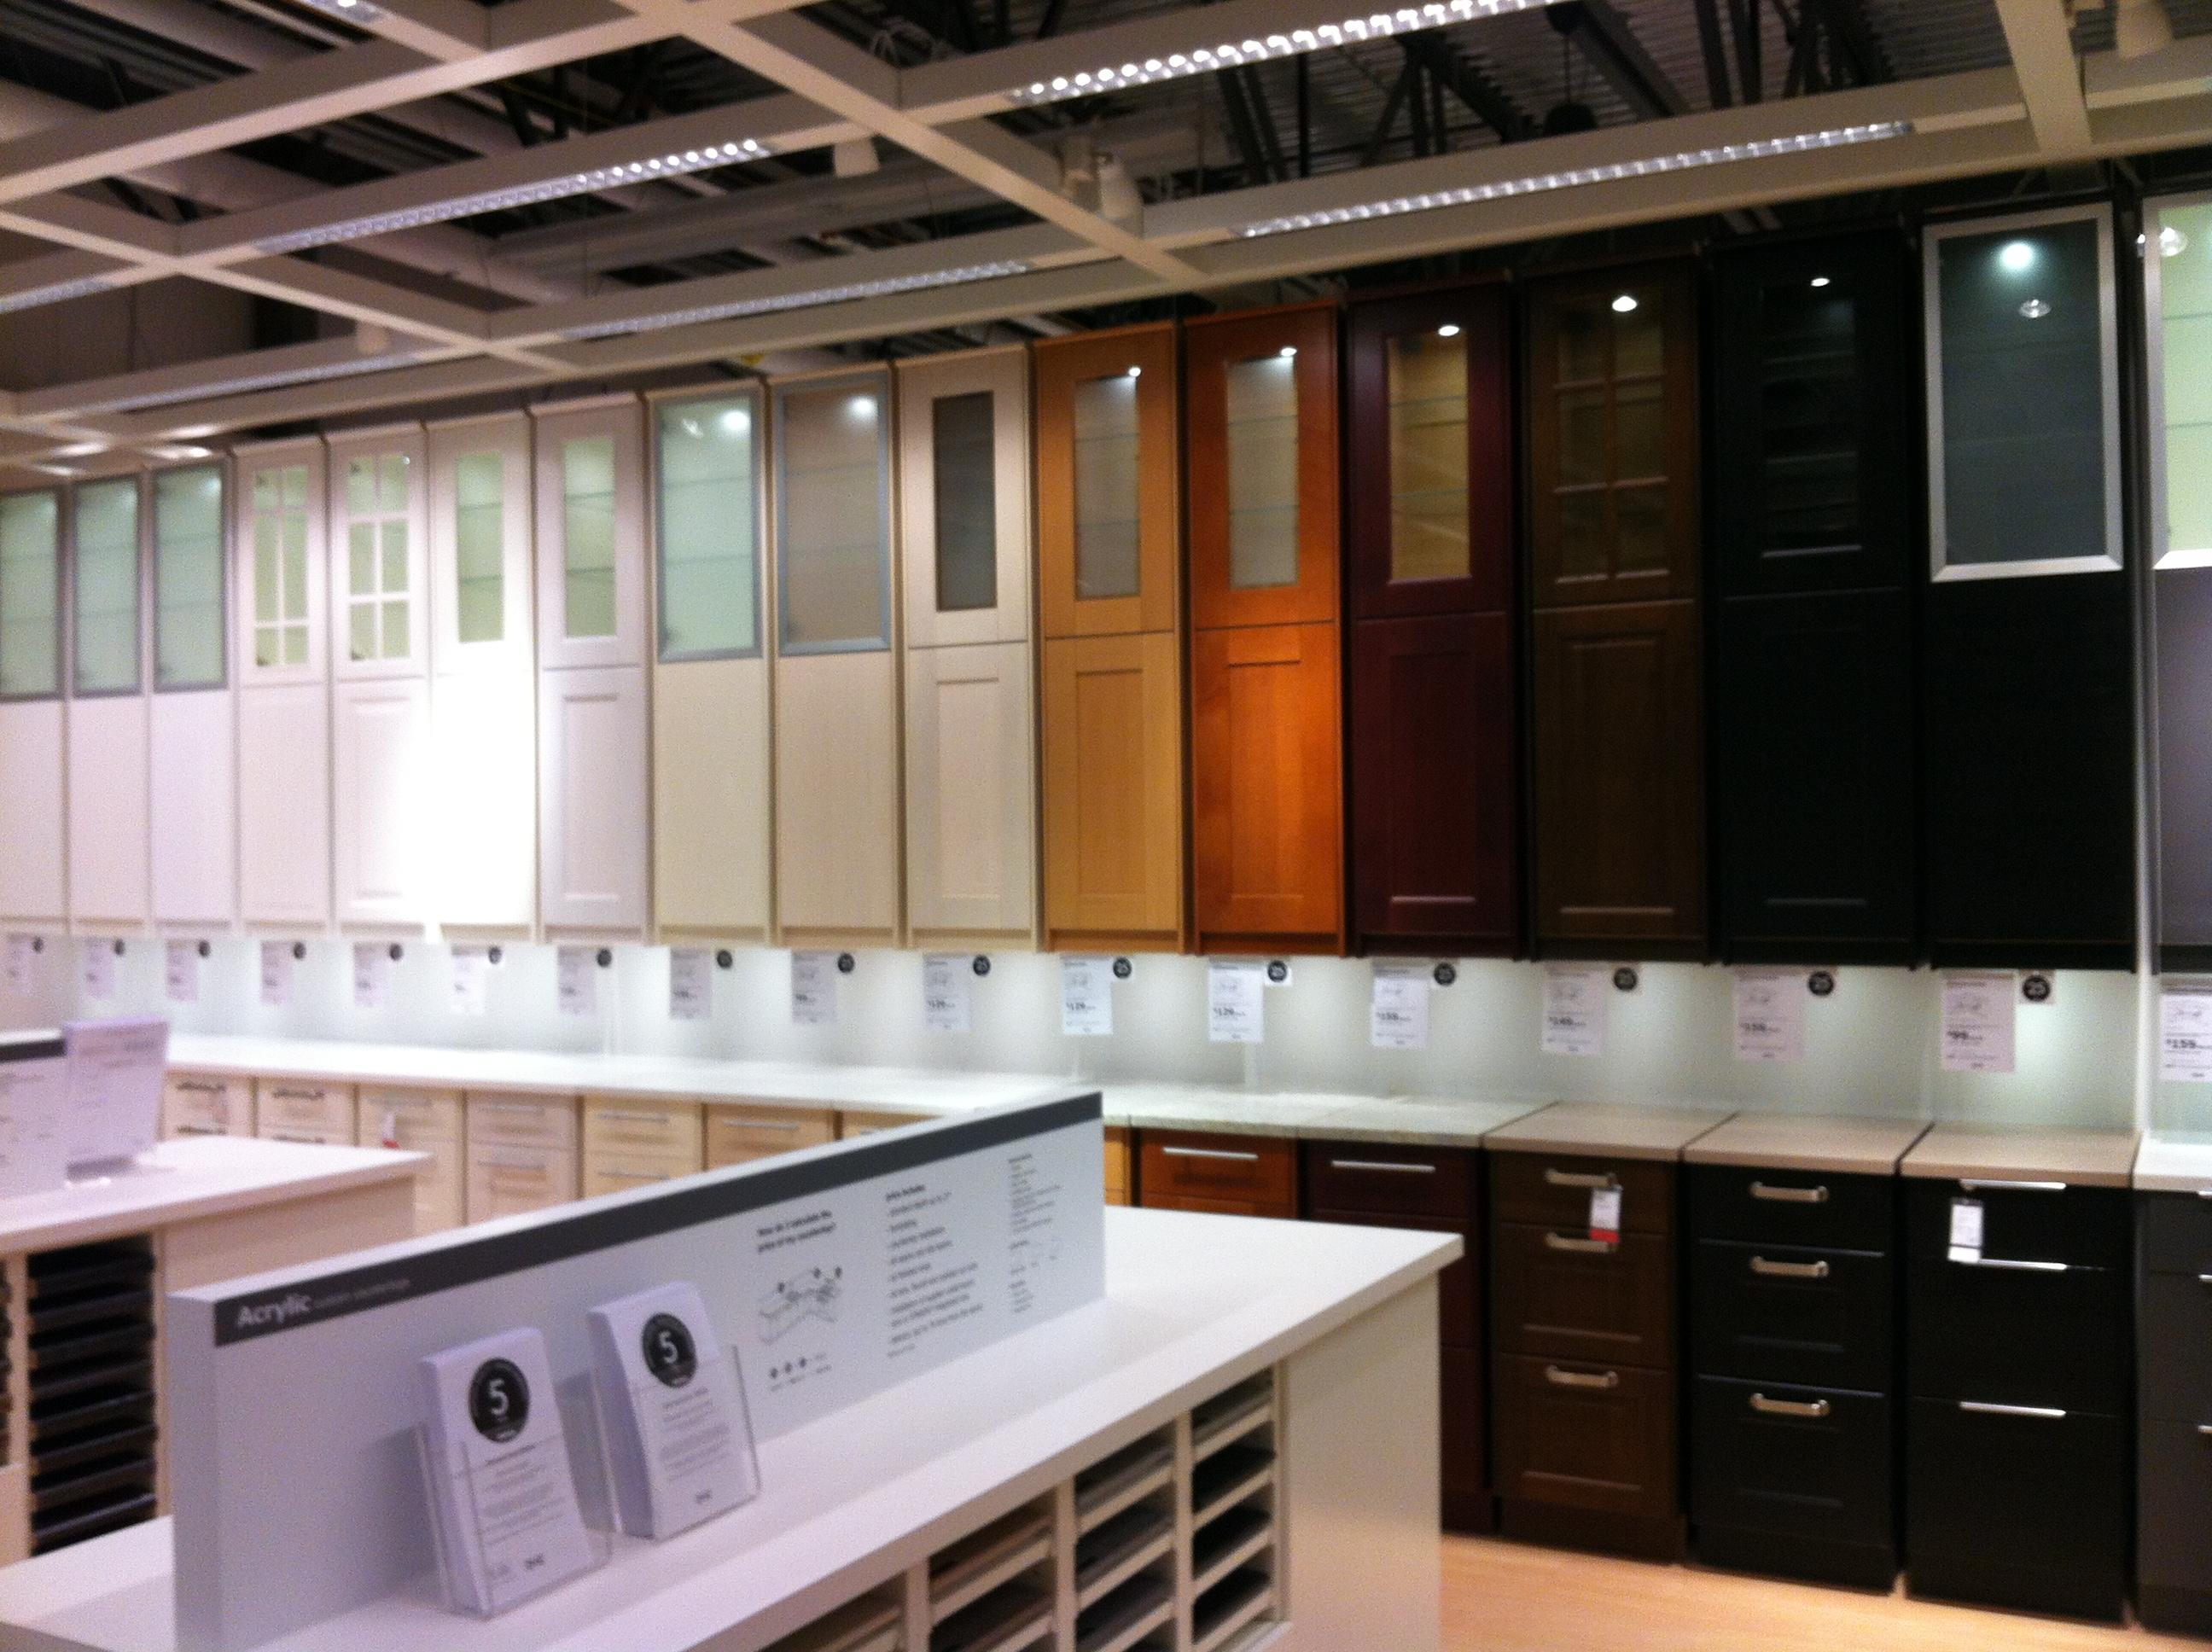 Credenza Piattaia Ikea : Ikea credenze offerte e risparmia su ondausu